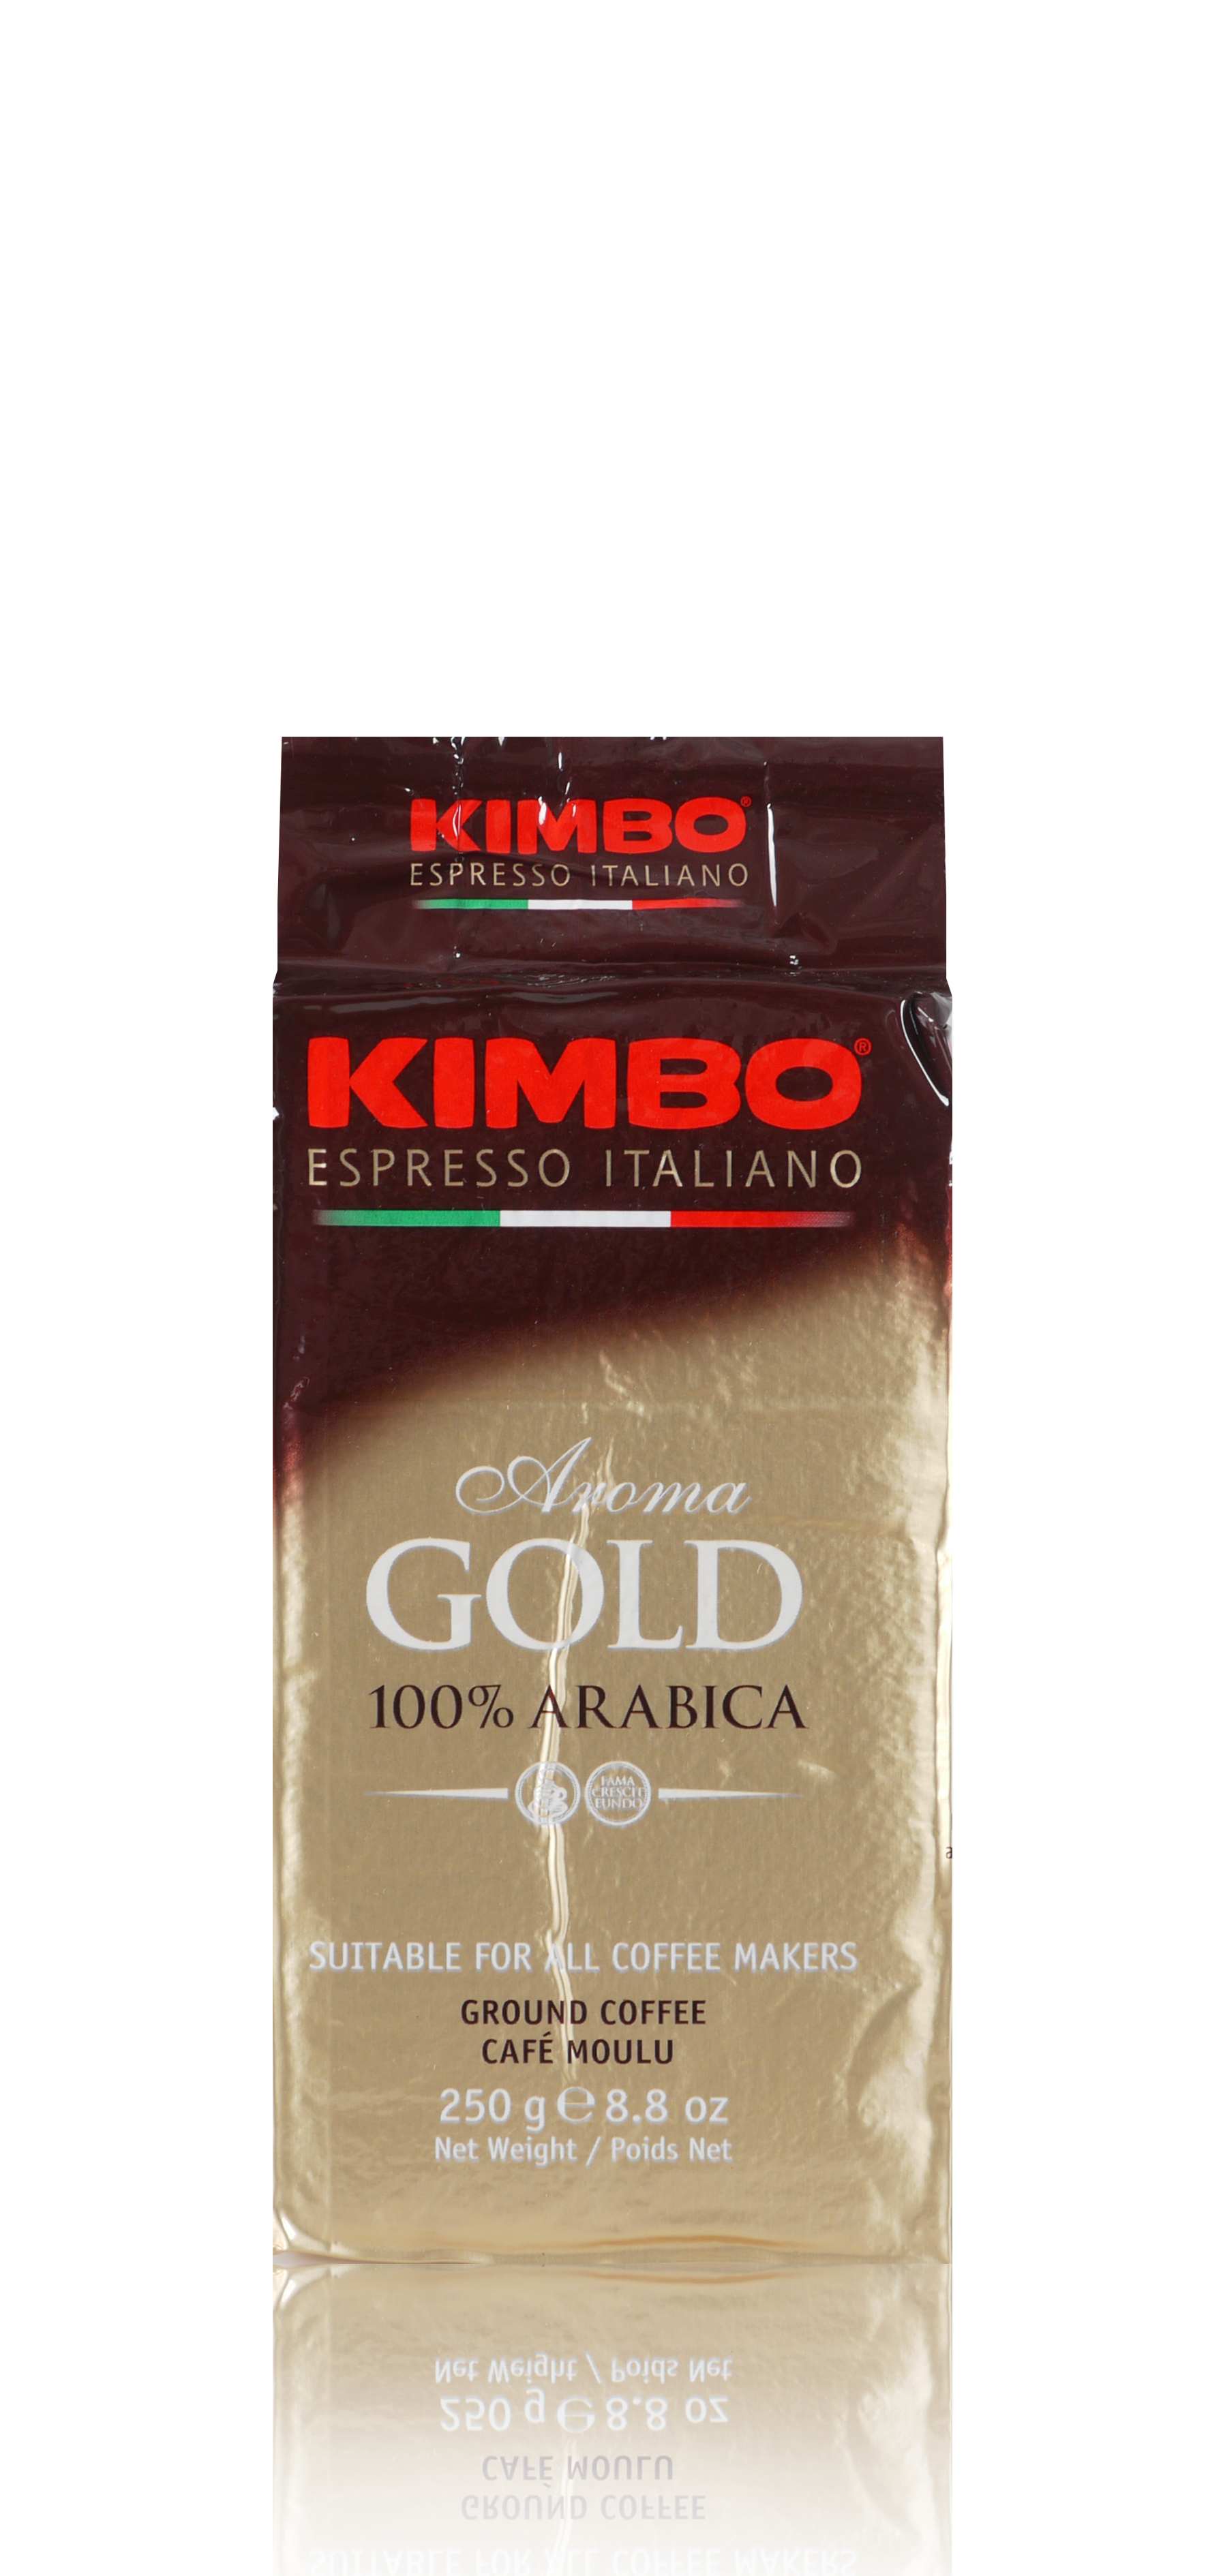 KIMBO Aroma Gold 100% Arabica 20x 250 g gemahlen und vakuumiert